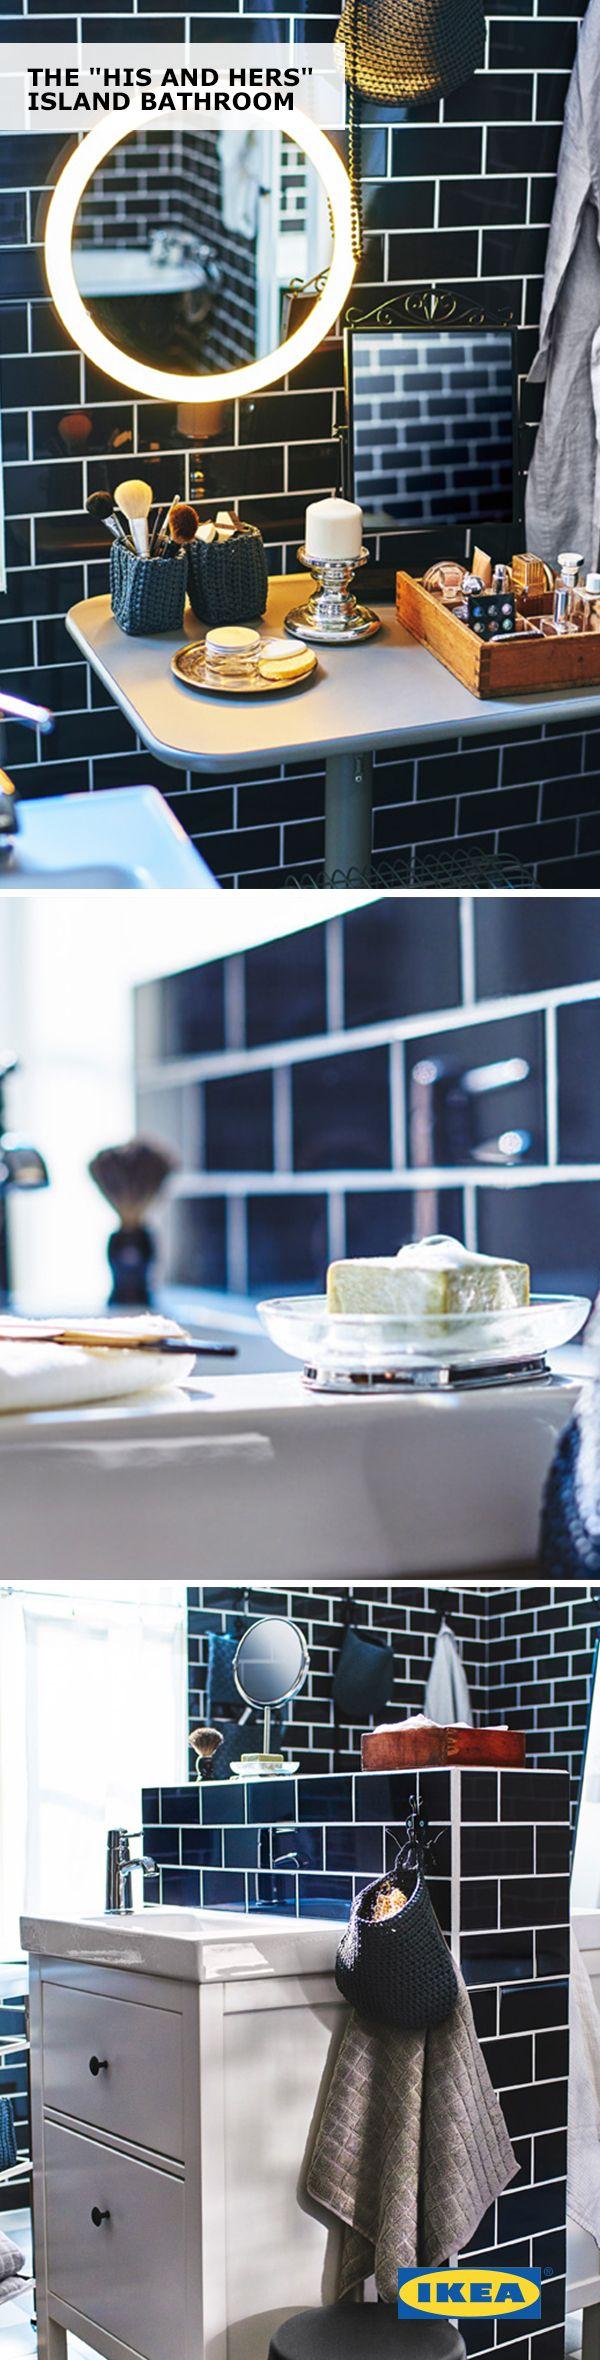 296 best Bathrooms images on Pinterest   Bathroom ideas, Bathrooms ...